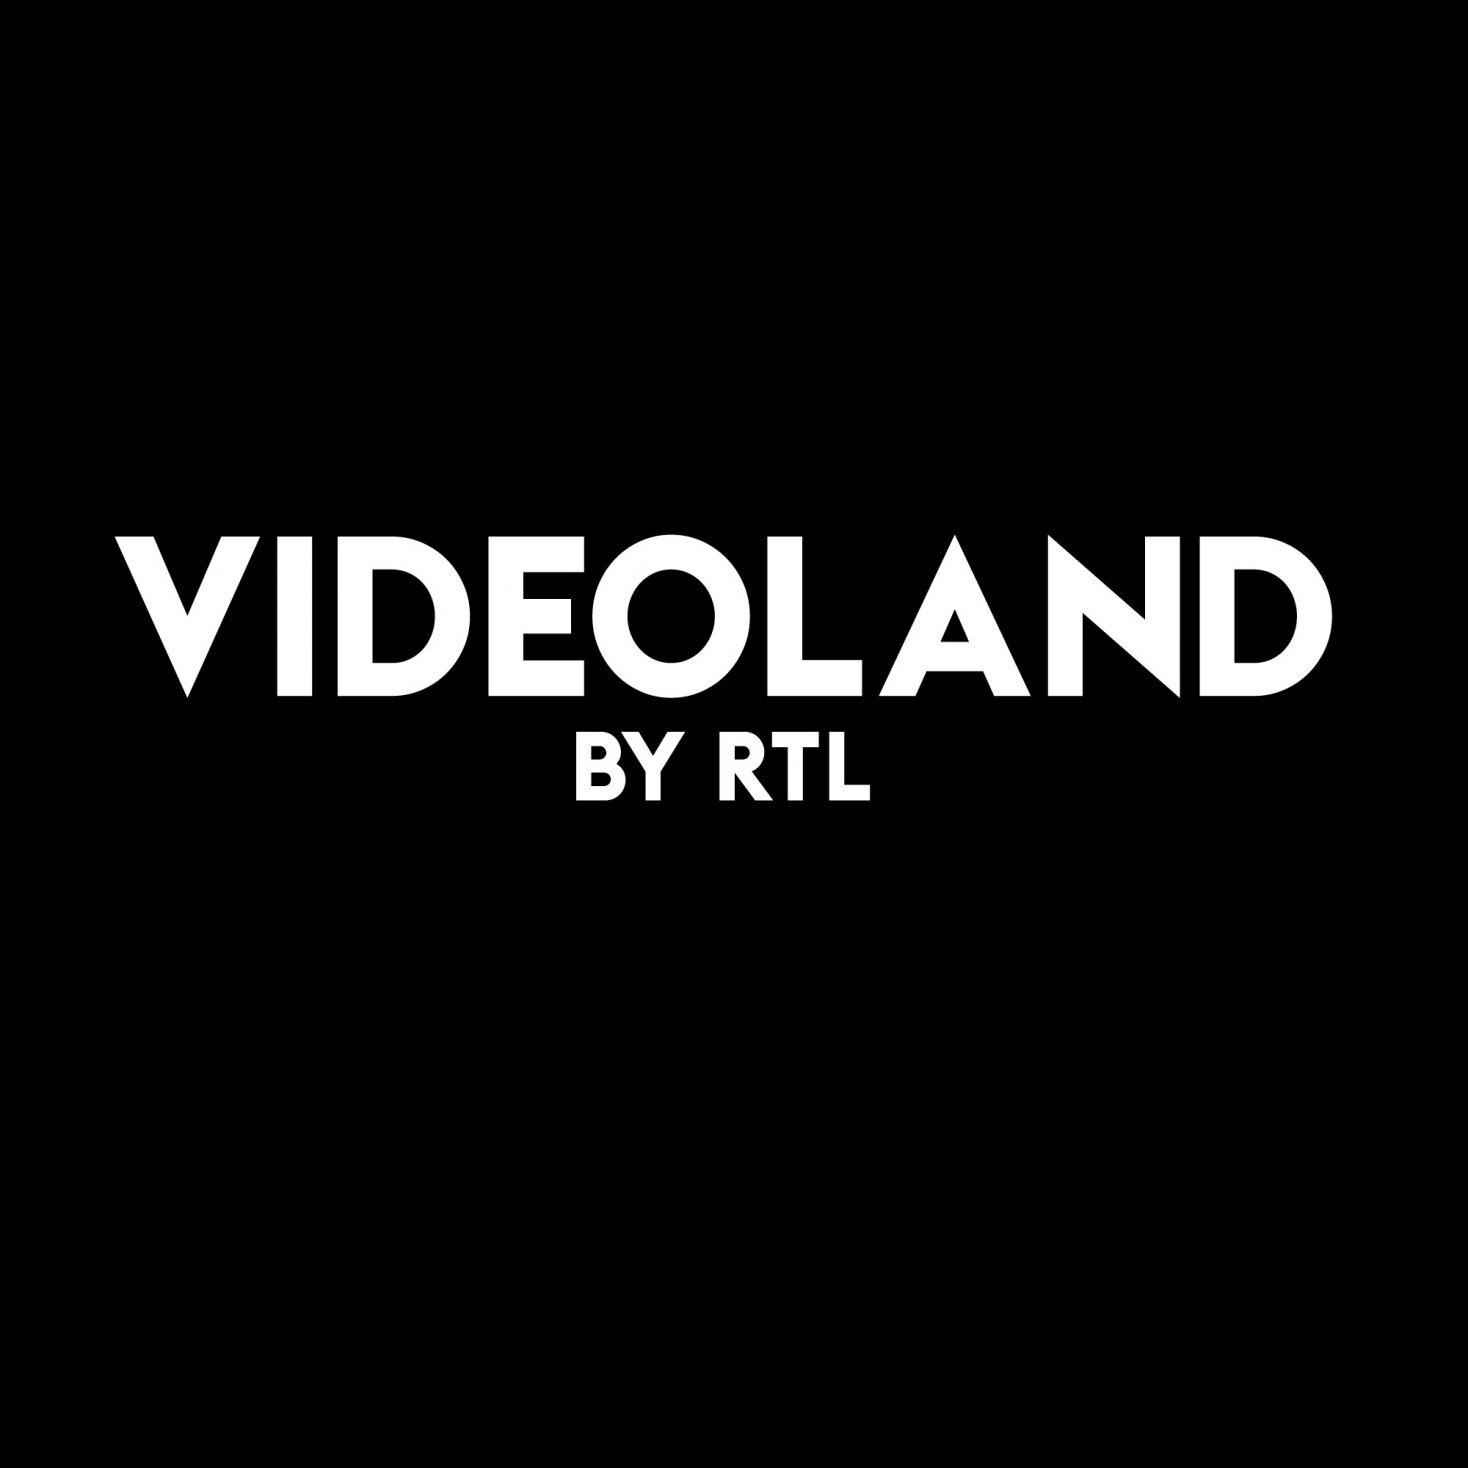 Videoland UHD Netherlands EU Works On NAIFEE JOY PC IOS Android Smart TV Set Top Box Tablet PC